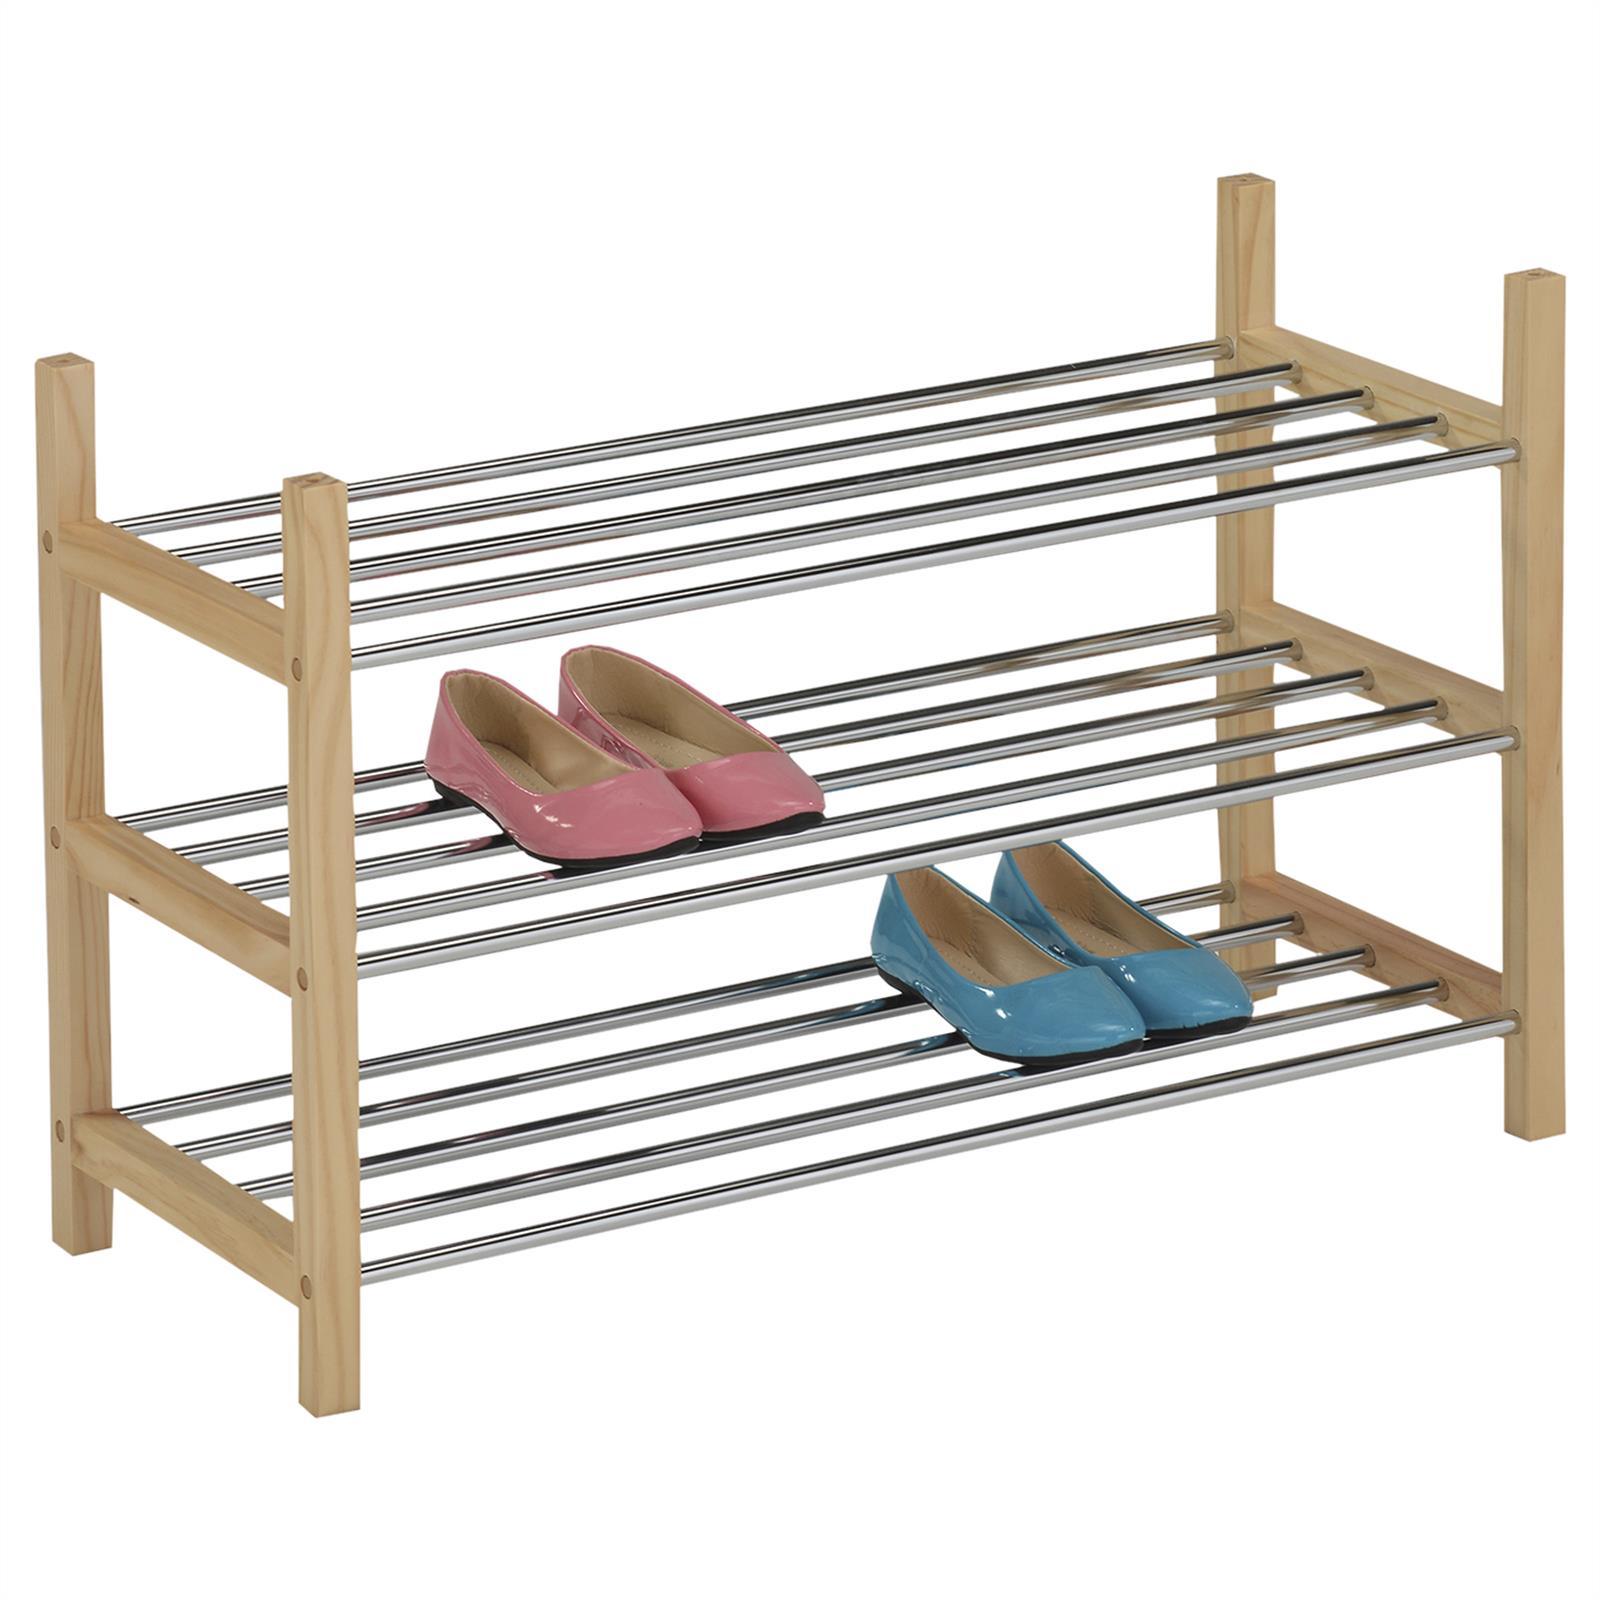 schuhregal resa mit 3 b den in natur mobilia24. Black Bedroom Furniture Sets. Home Design Ideas